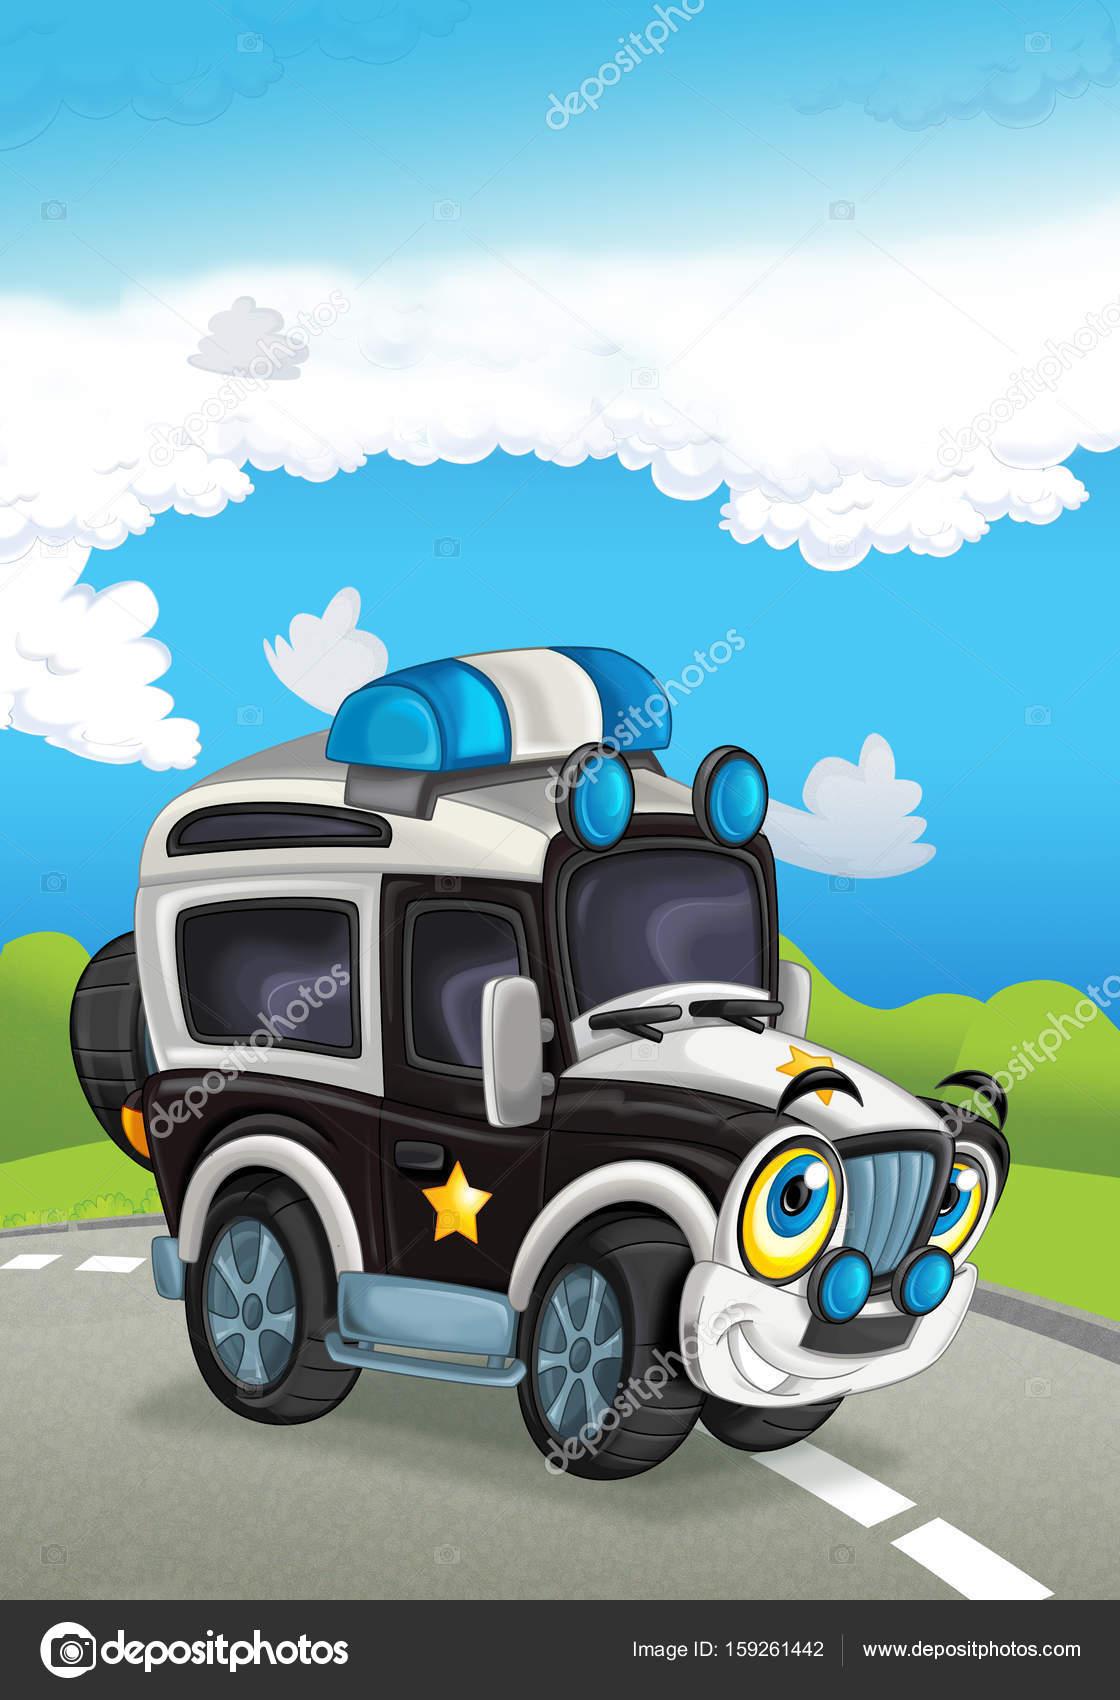 Voiture de police de dessin anim sur la route photographie illustrator hft 159261442 - Voiture police dessin anime ...